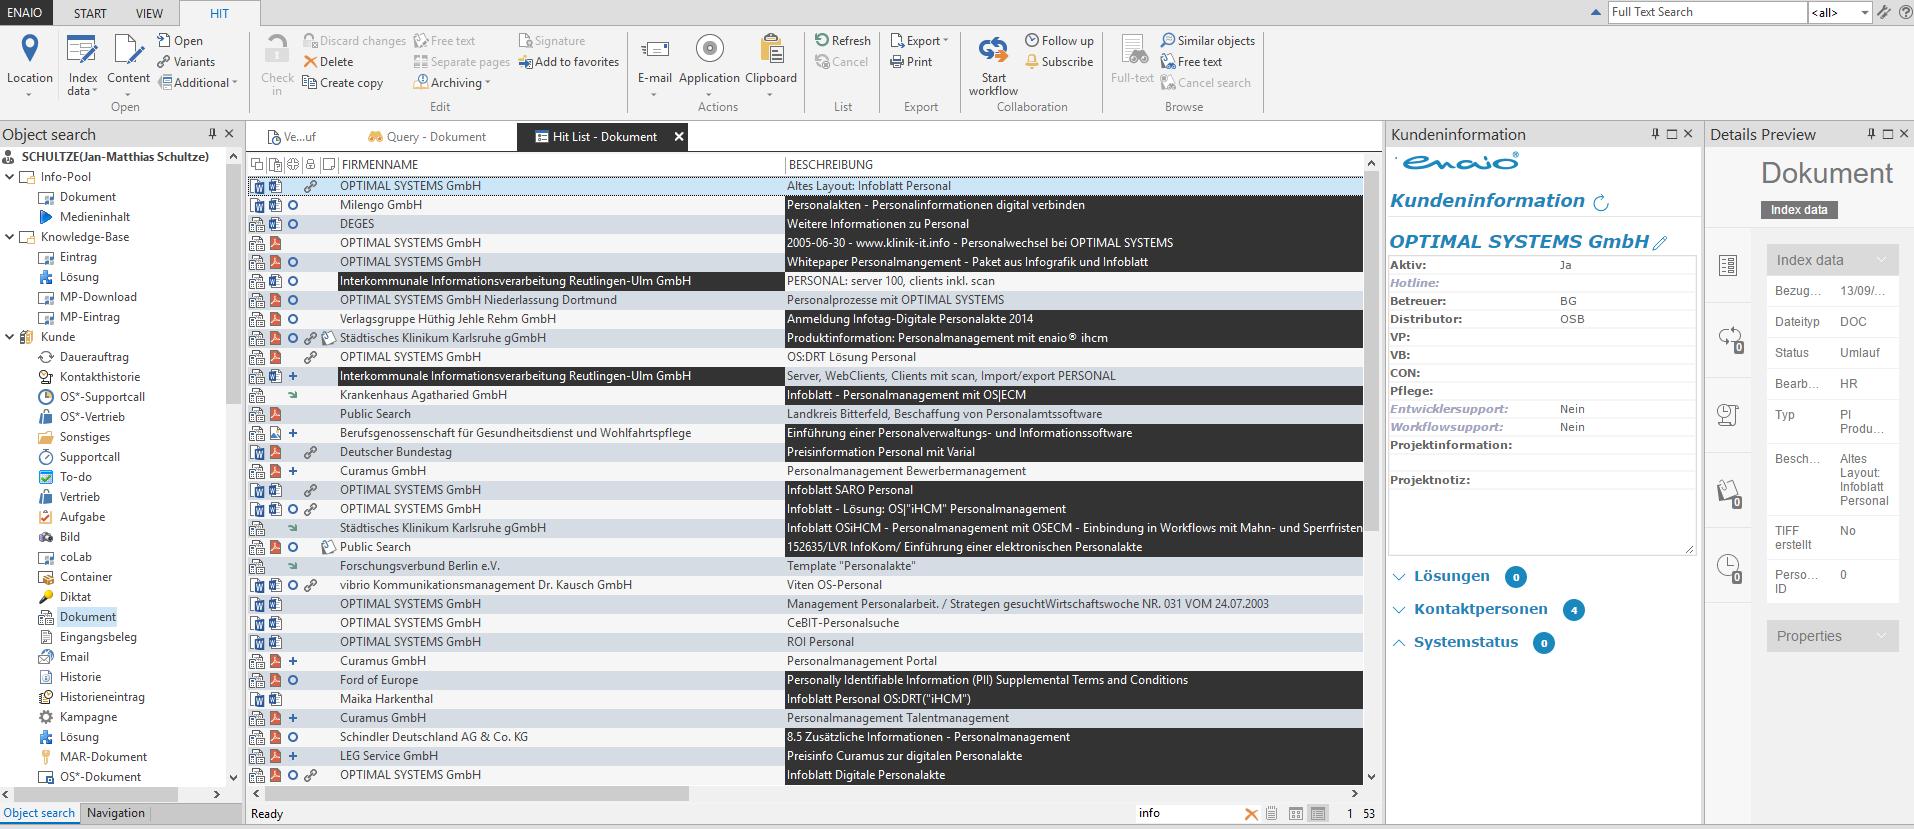 screenshot enaio® business partner records hit list